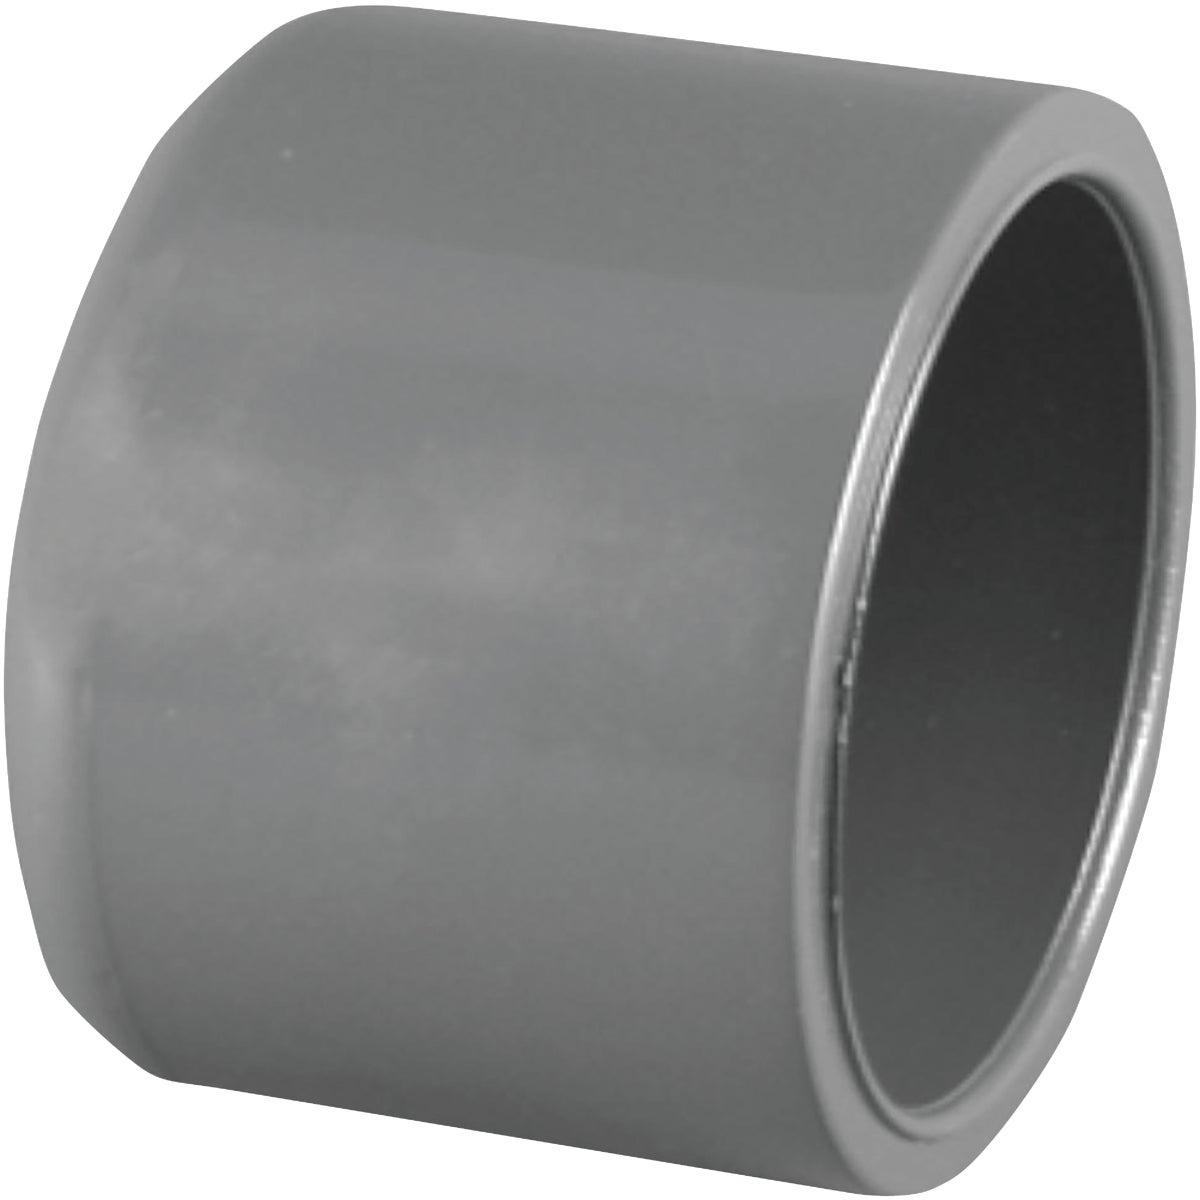 "3/4"" SCH80 PVC CAP - 301578 by Genova Inc"